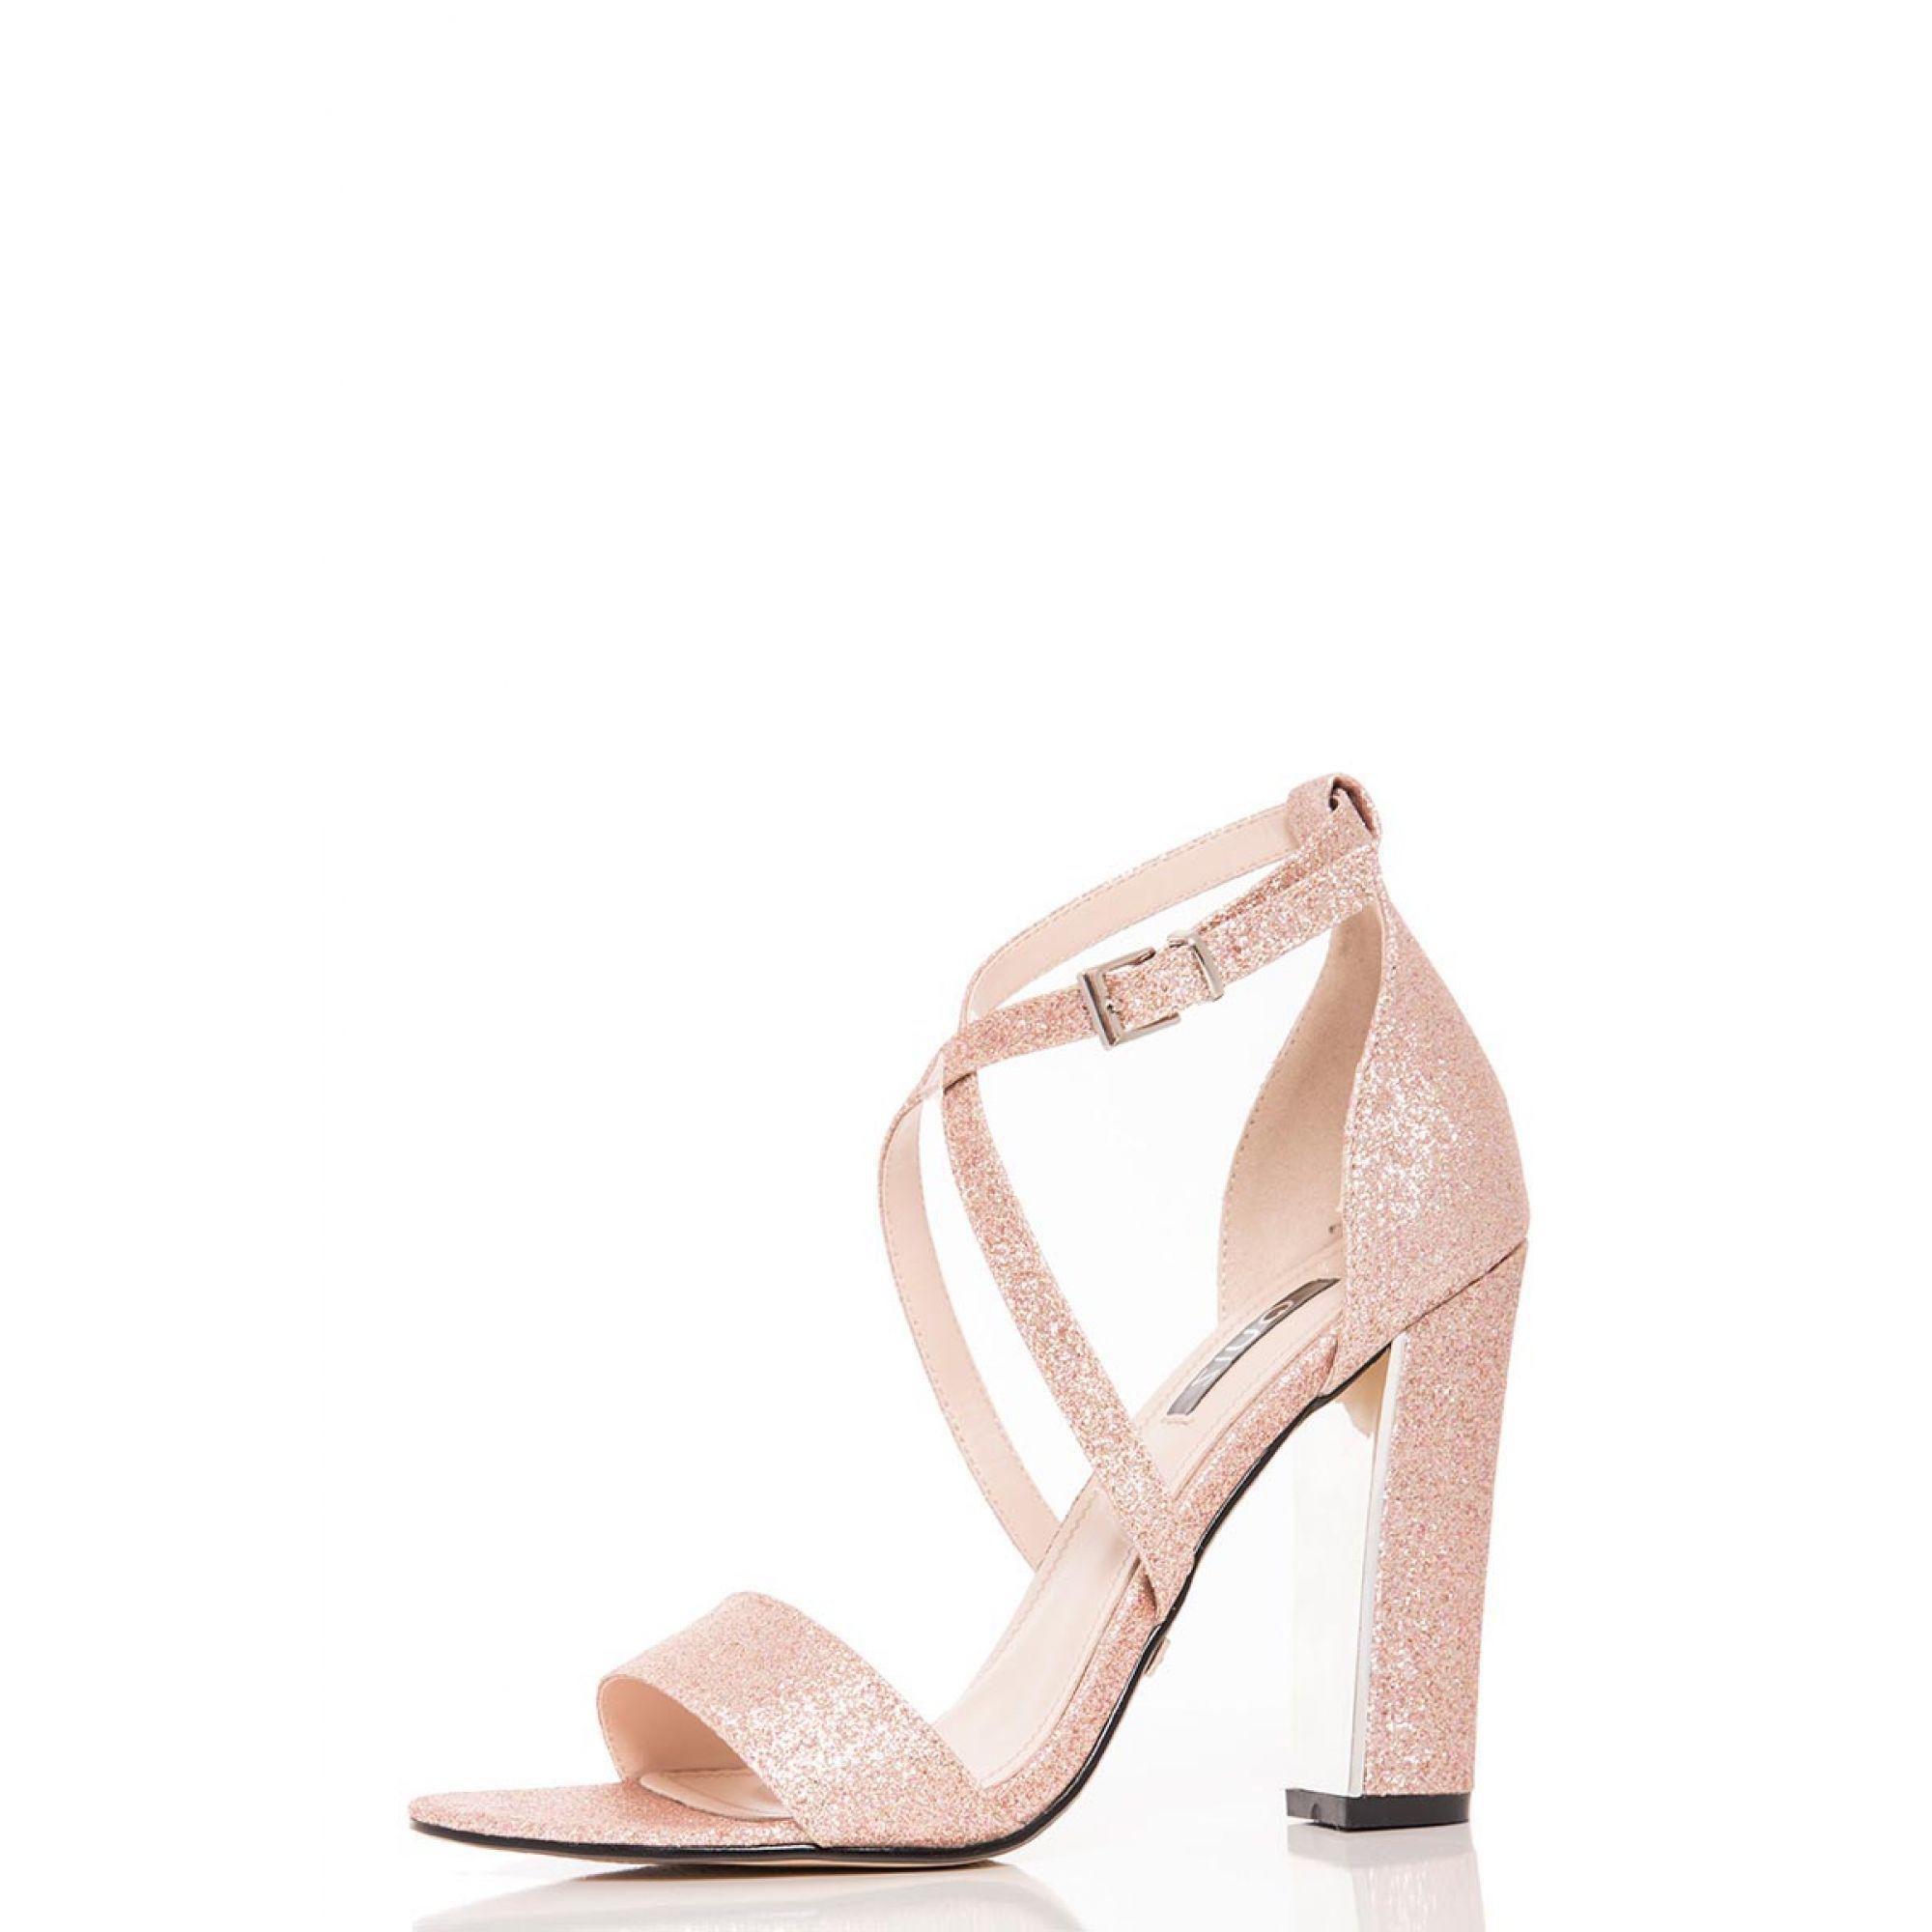 881ea379ae5 Quiz Rose Gold Glitter Block Heel Strappy Sandals in Metallic - Lyst